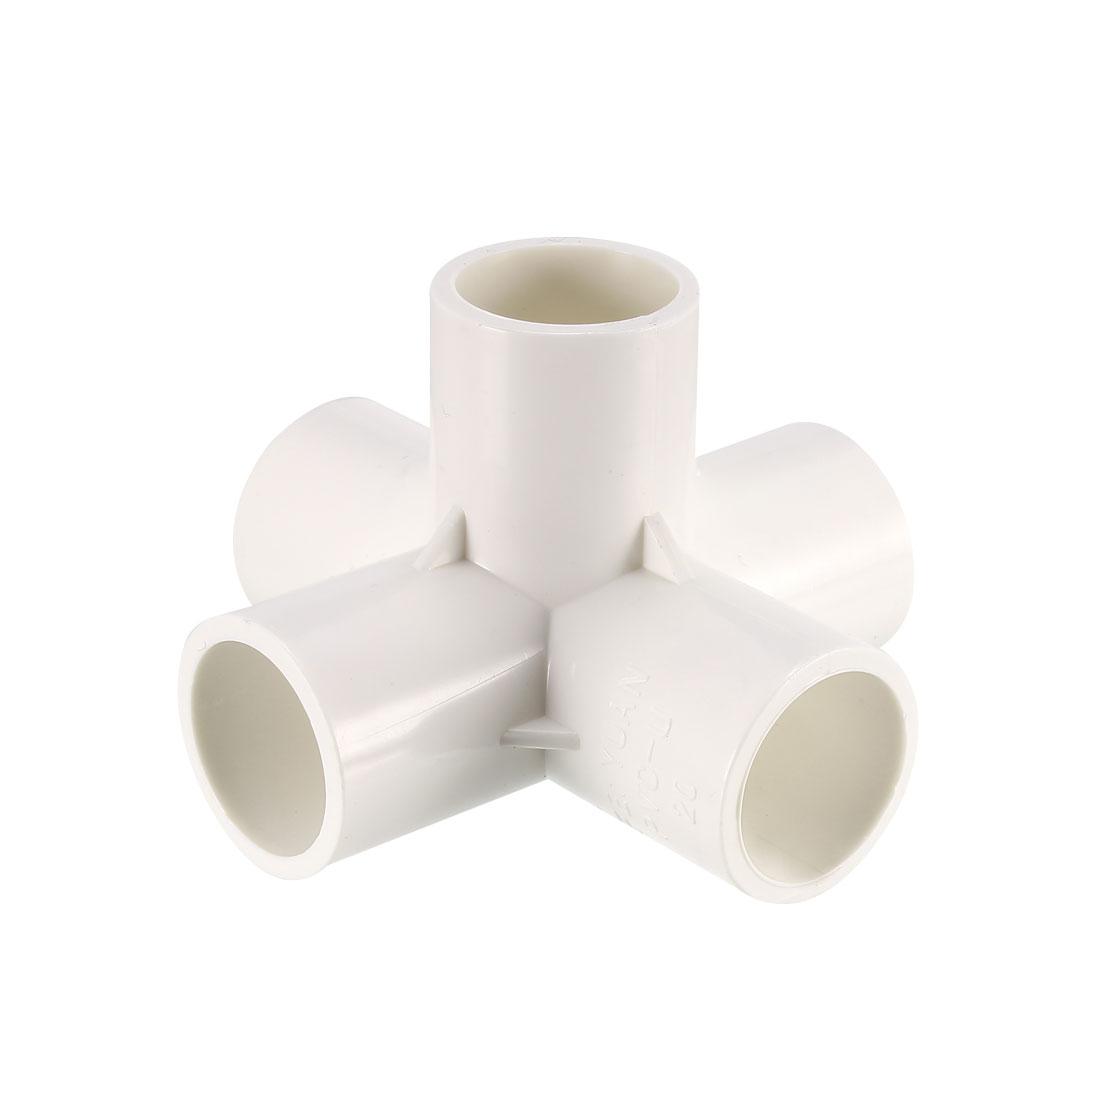 5 Way 20mm Tee PVC Fitting Elbow - PVC Furniture - PVC Elbow Fittings 2Pcs